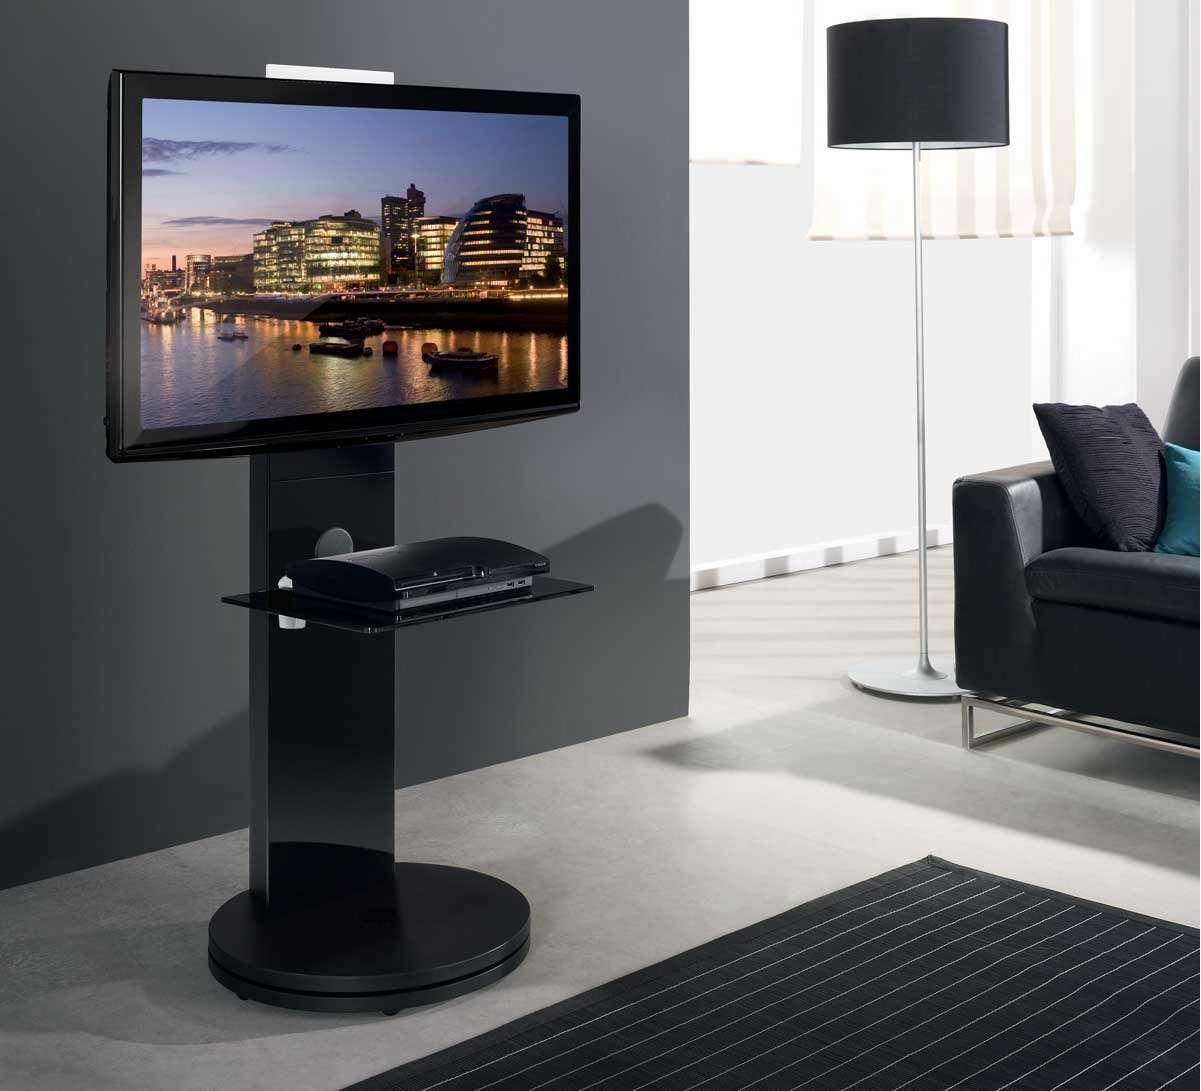 B Tech Btf811 Black Corner Cantilever Tv Stand Regarding Cantilever Glass Tv Stands (View 2 of 20)